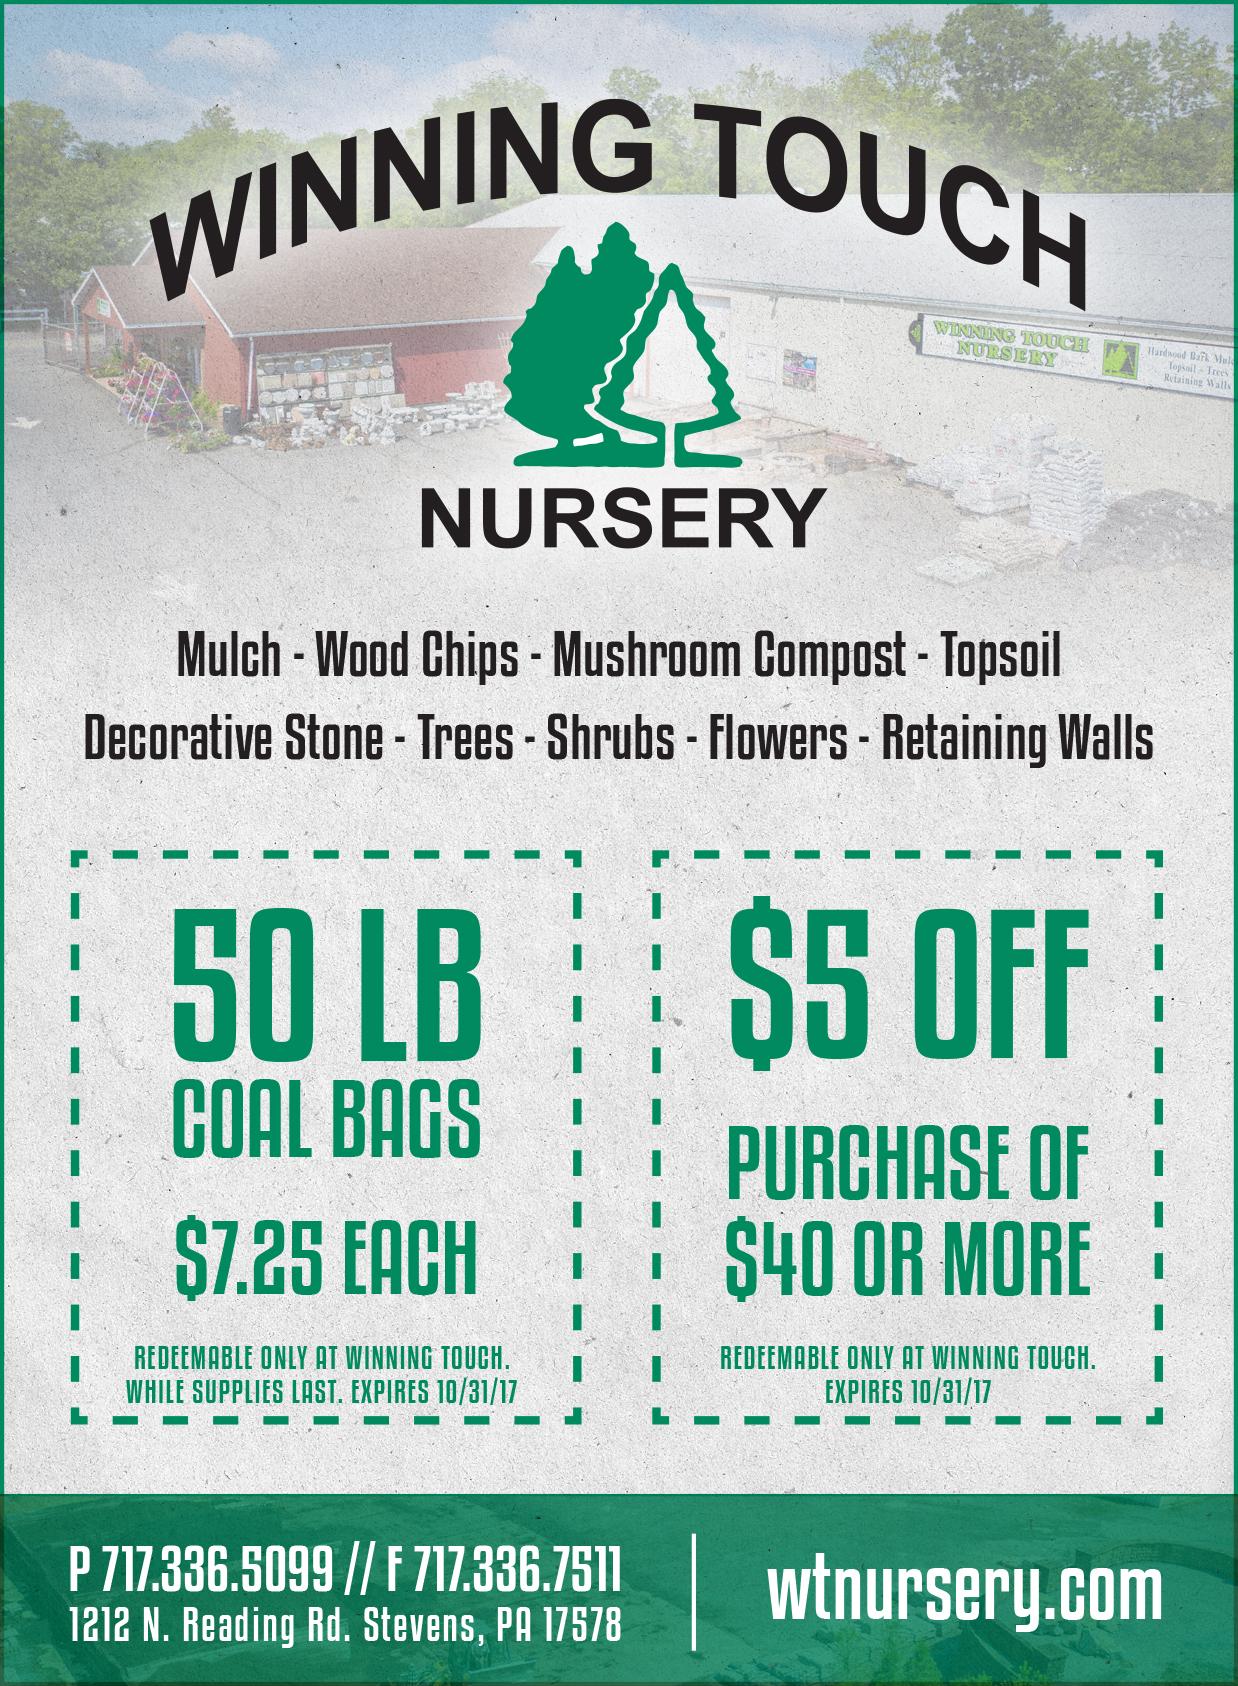 Winning Touch Nursery Quarter Page Ad_October_FINAL.jpg